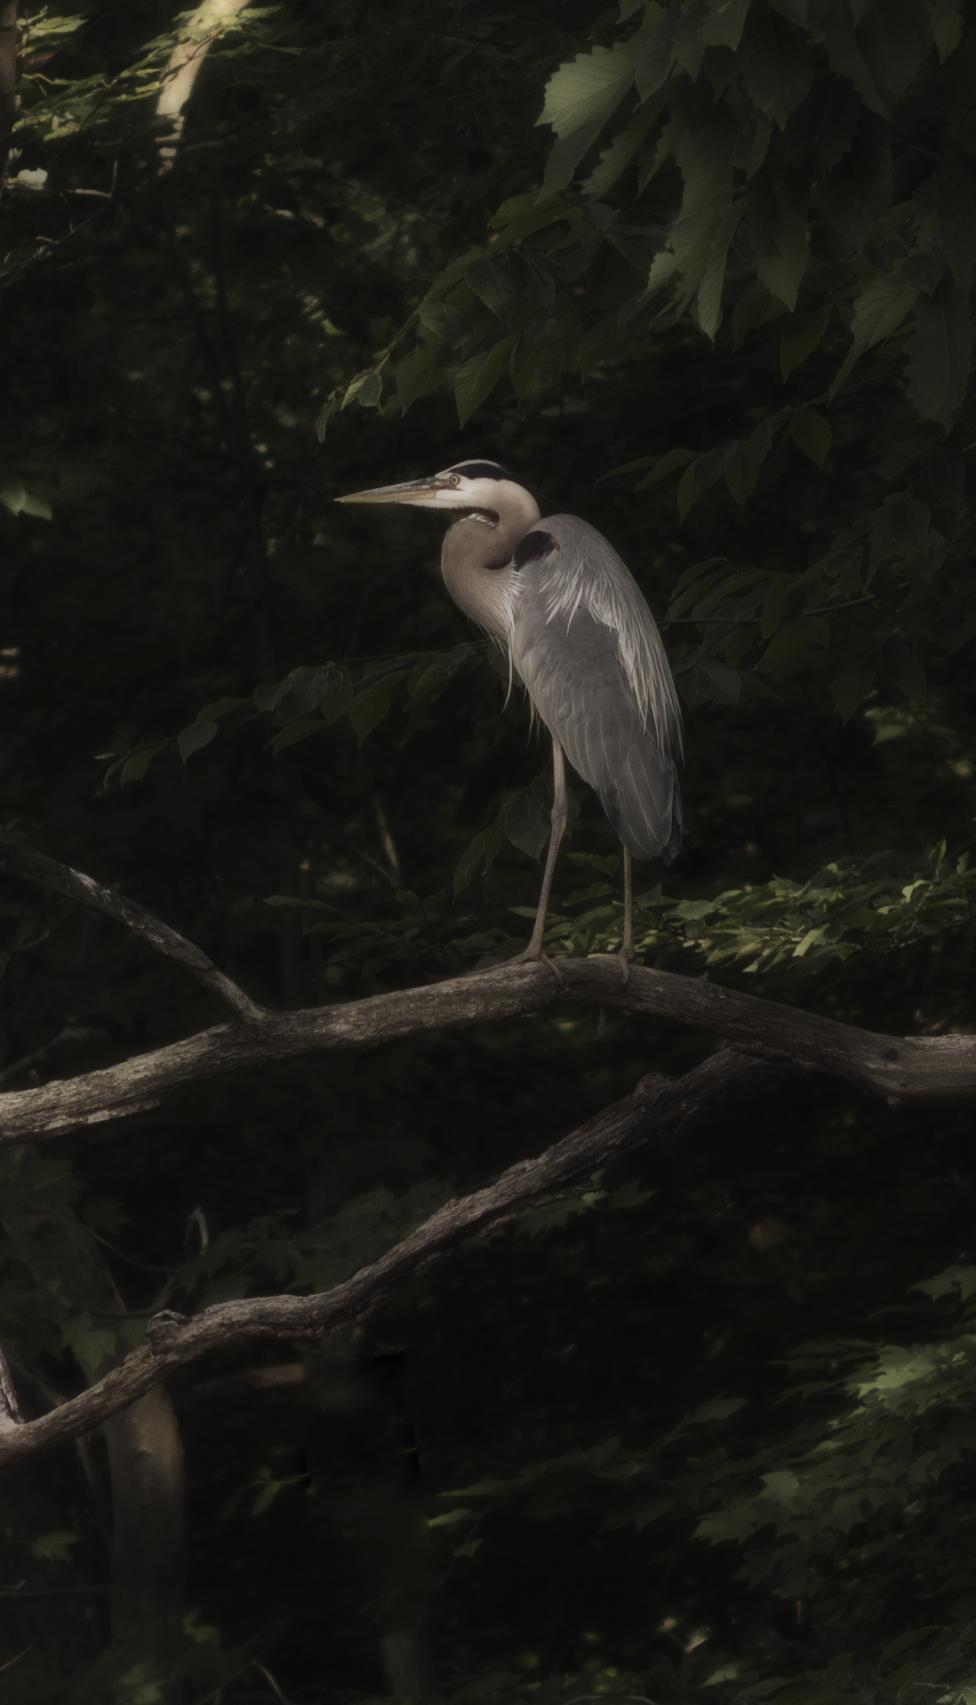 Blue Heron sitting on branch along Cheaspeake Bay.